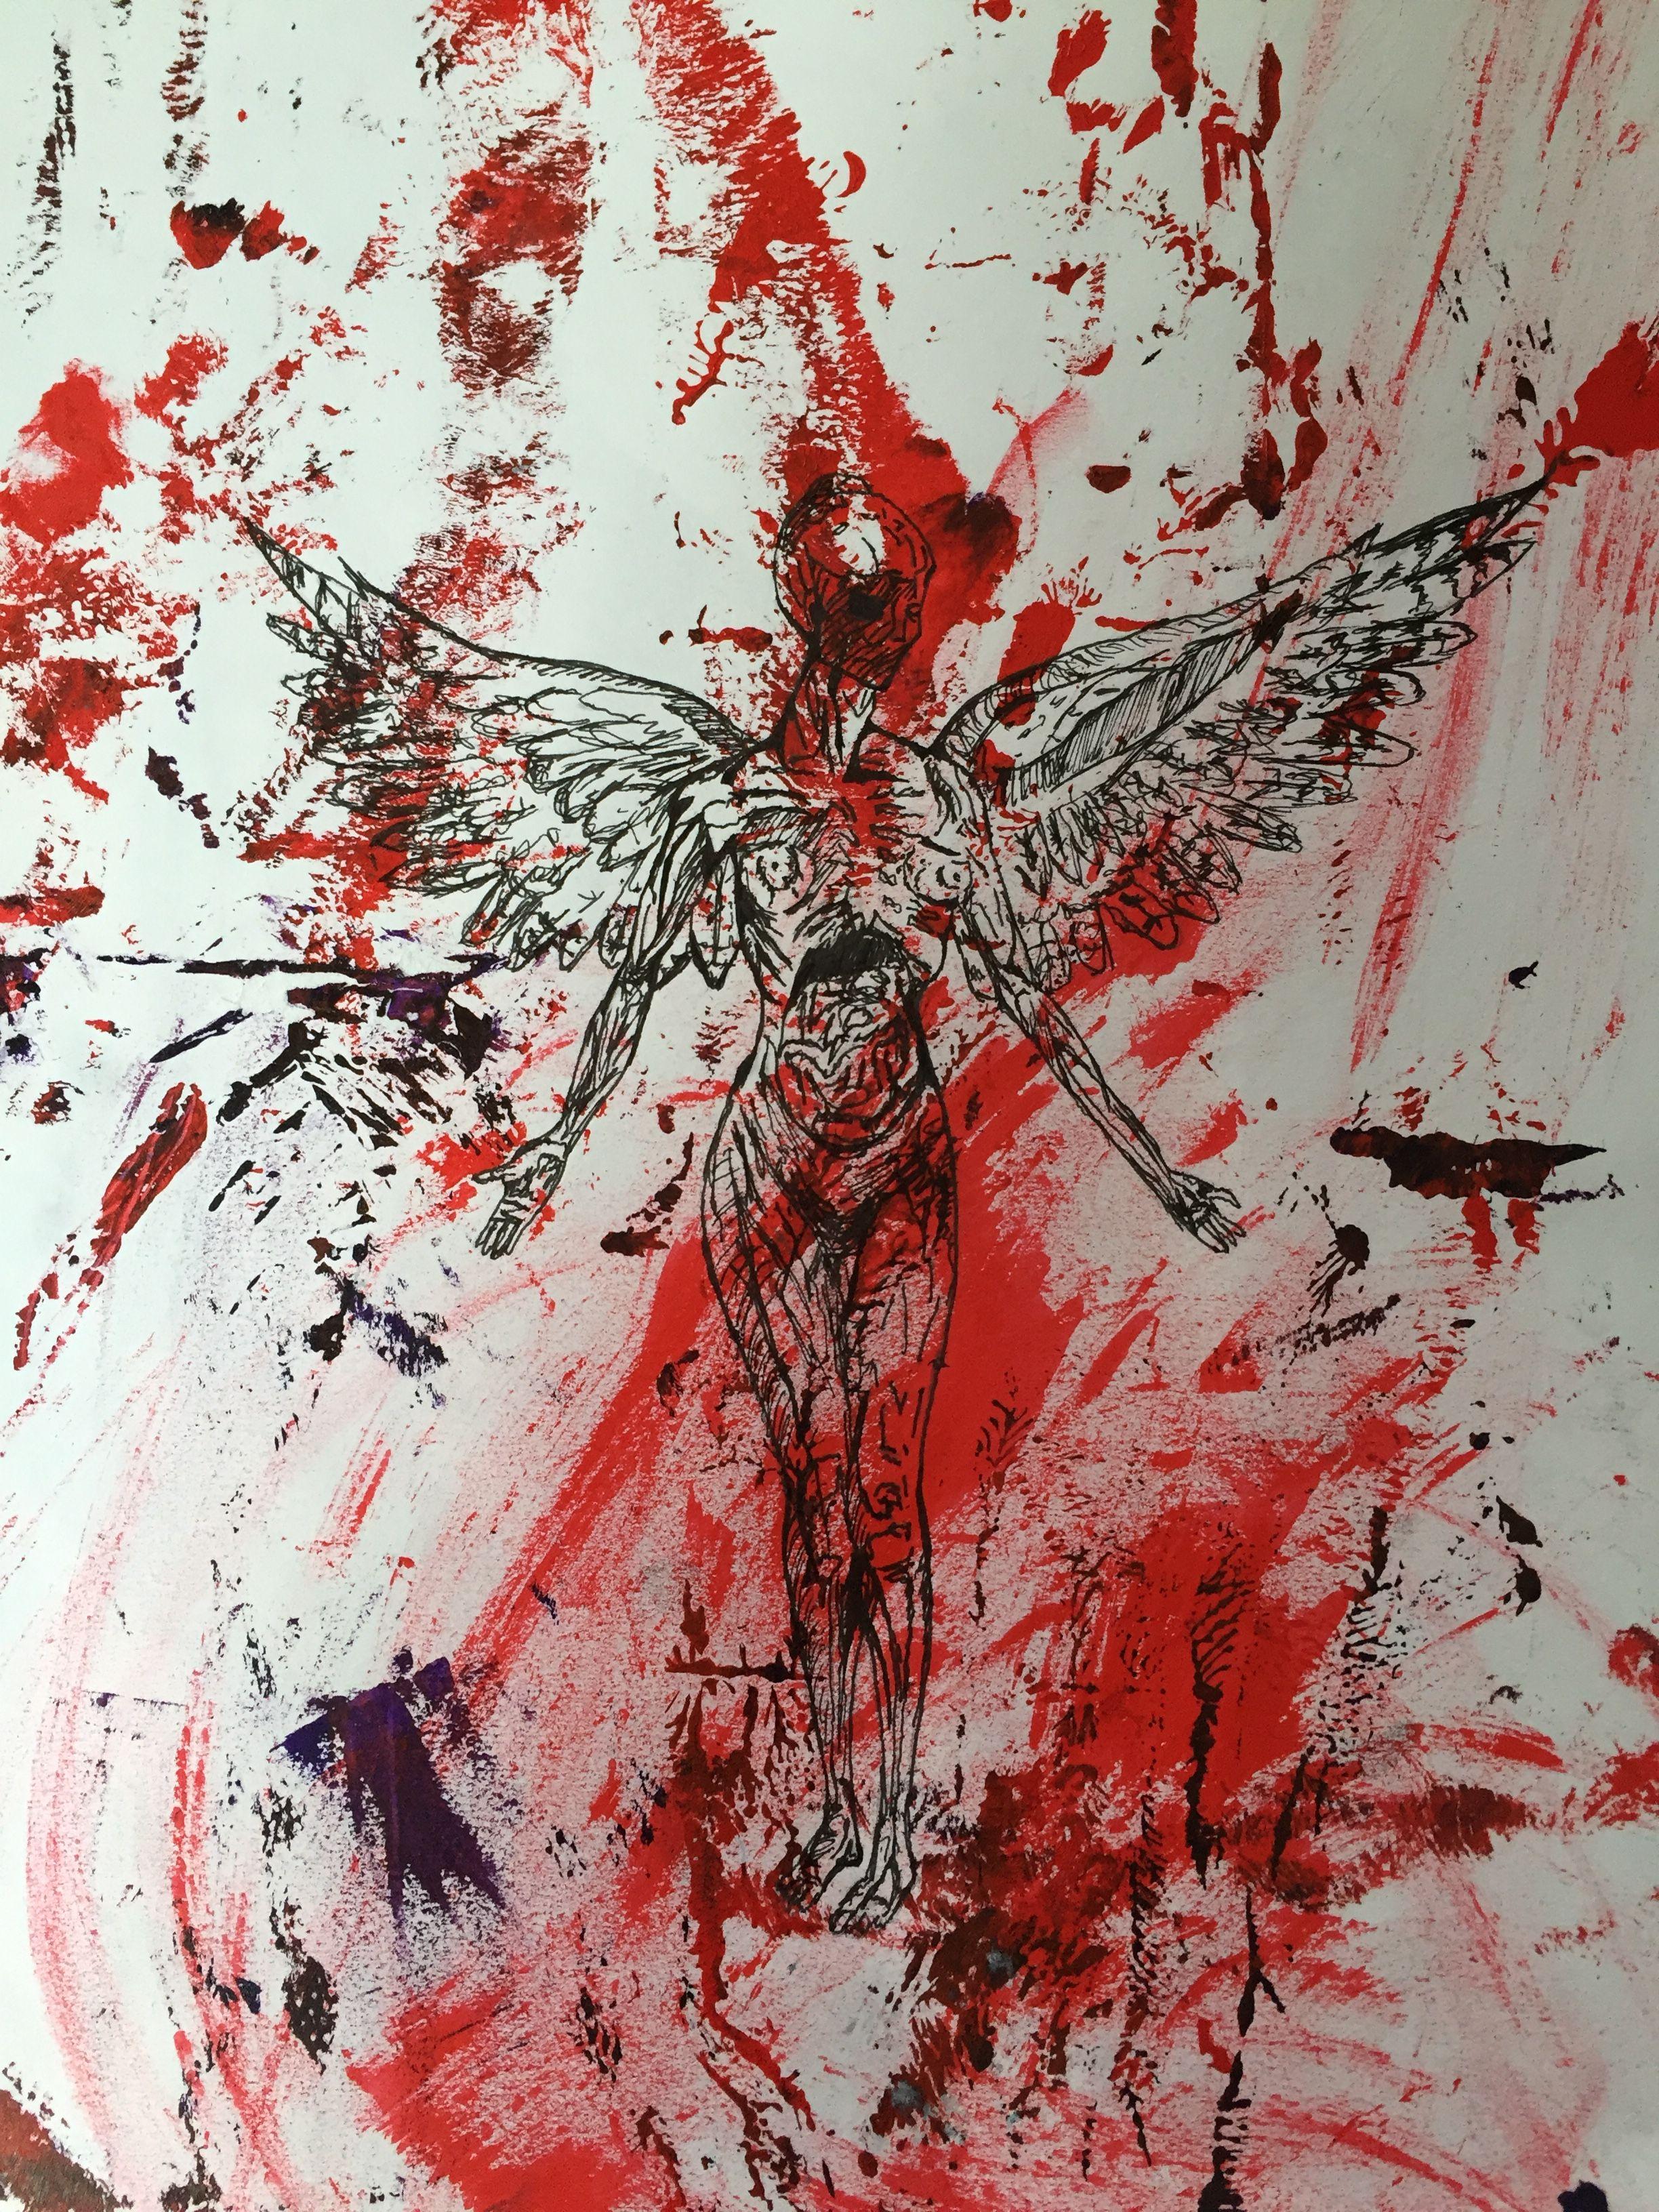 #nirvana #art #emotion #musicart